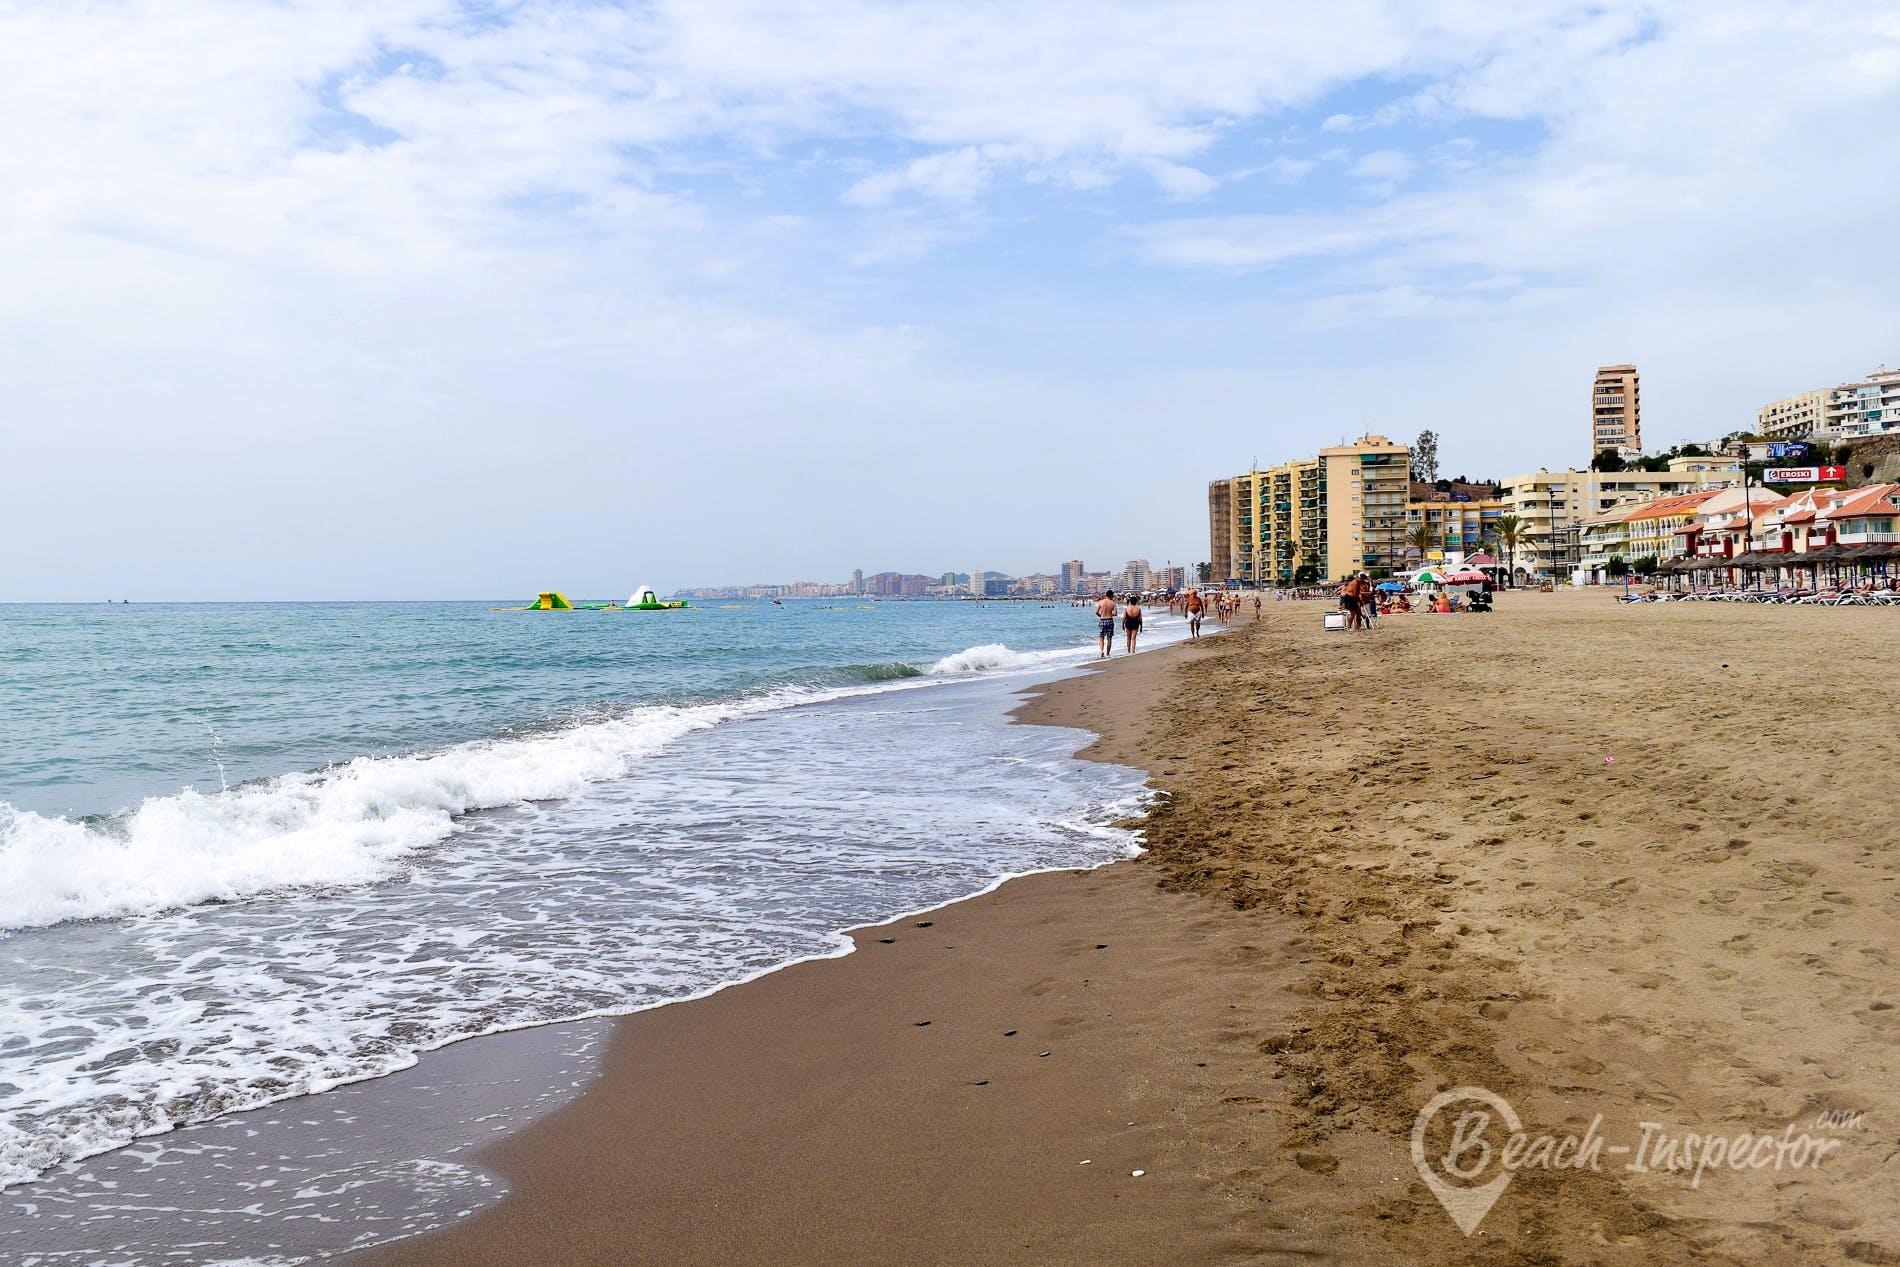 Beach Playa de Carvajal, Costa del Sol, Spain